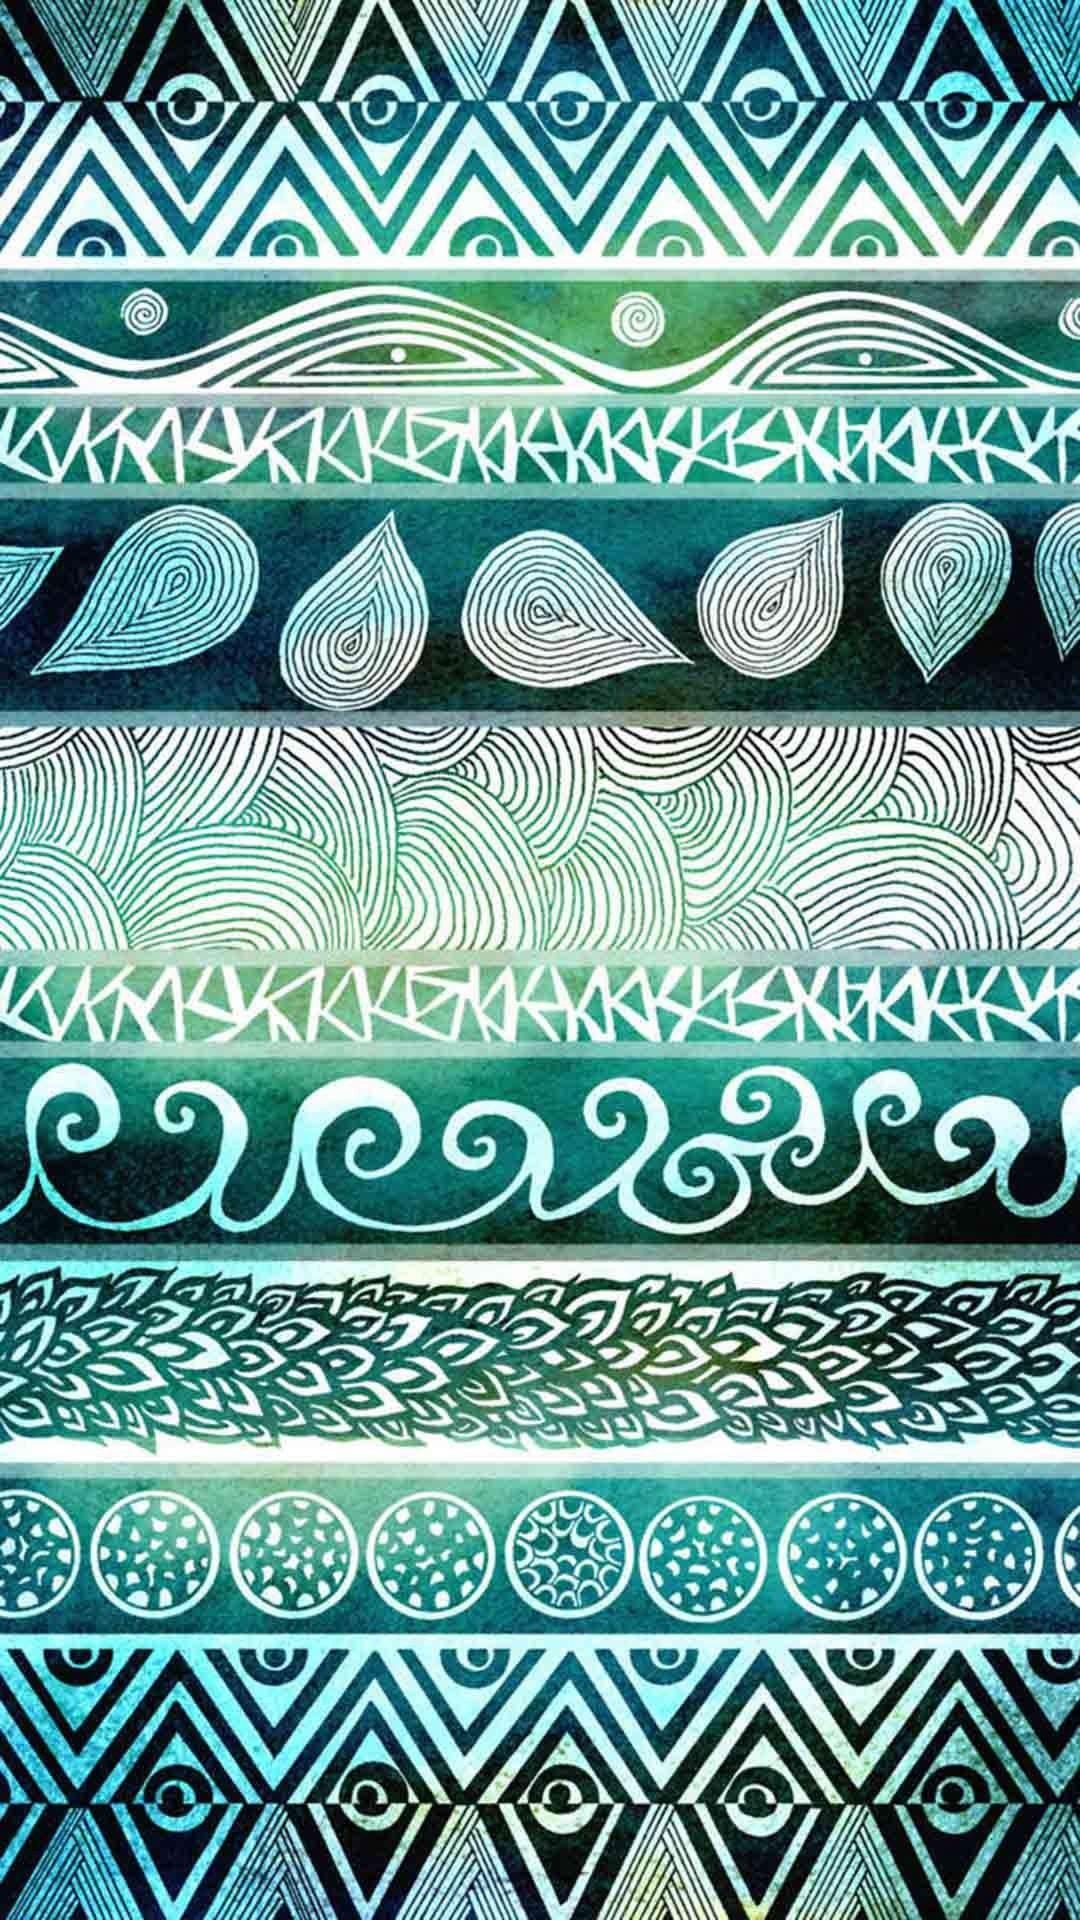 Pin By Samantha Keller On Pat Tribal Patterns Tribal Pattern Pattern Wallpaper In 2020 Tribal Patterns Tribal Pattern Pattern Wallpaper